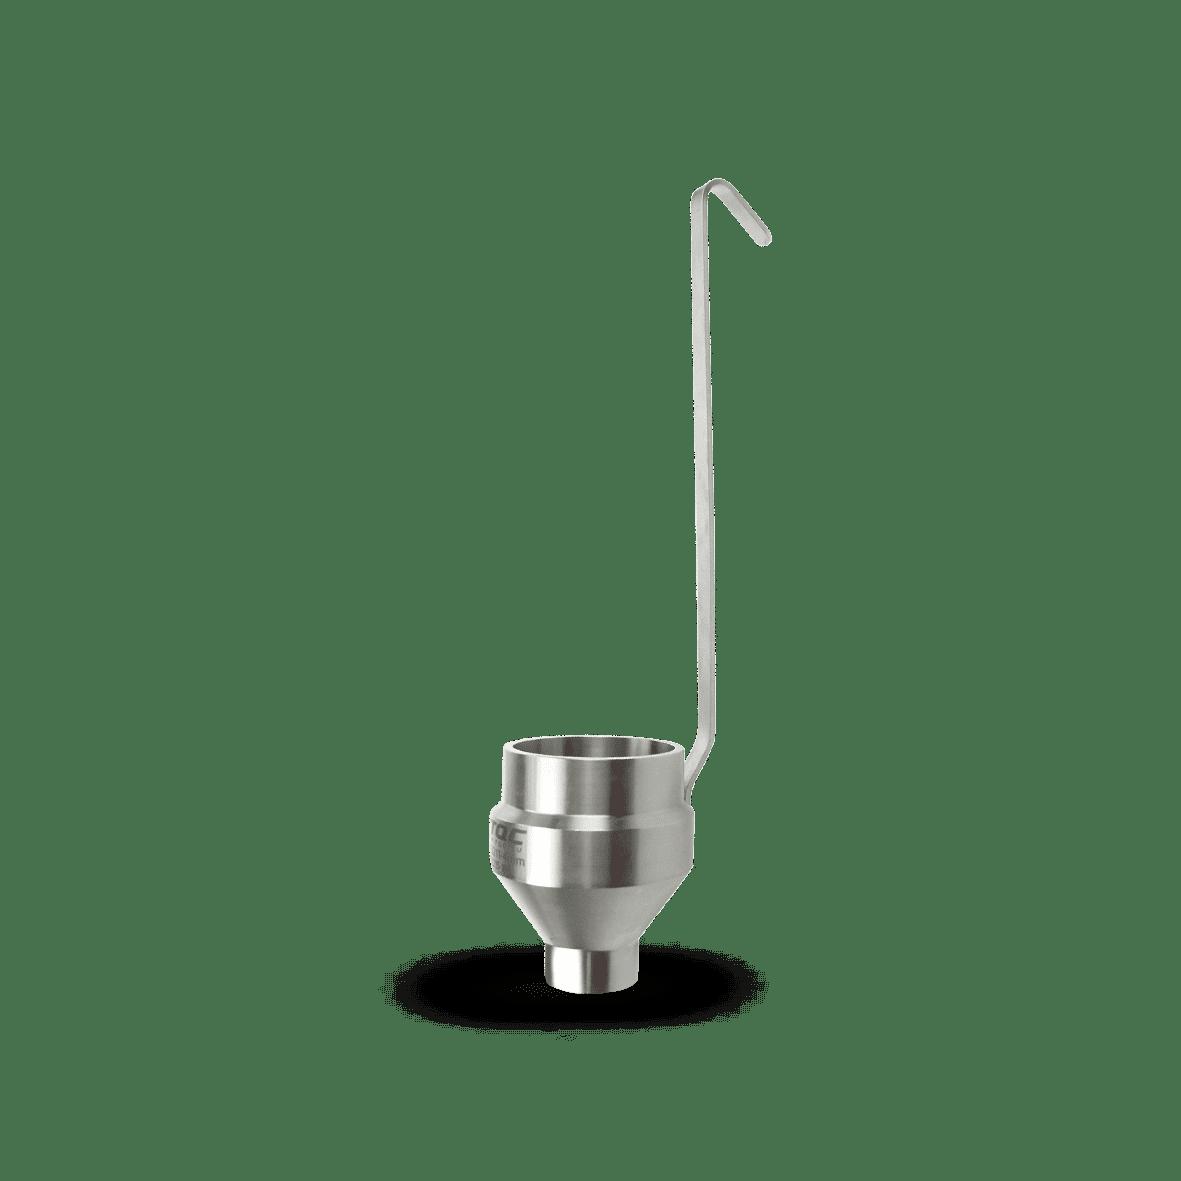 Frikmer cup